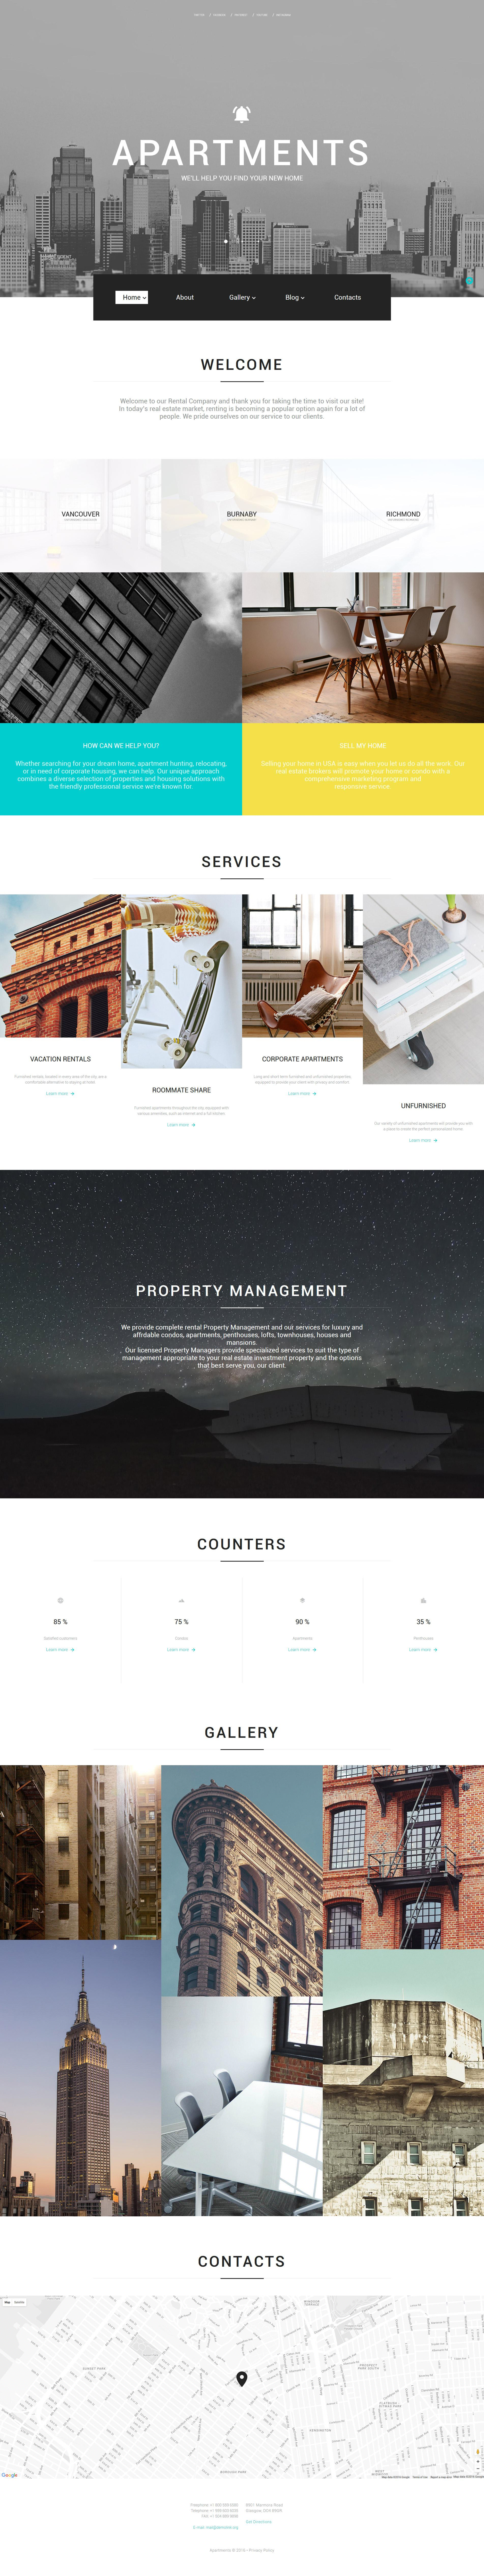 Apartments Template Web №58726 - screenshot